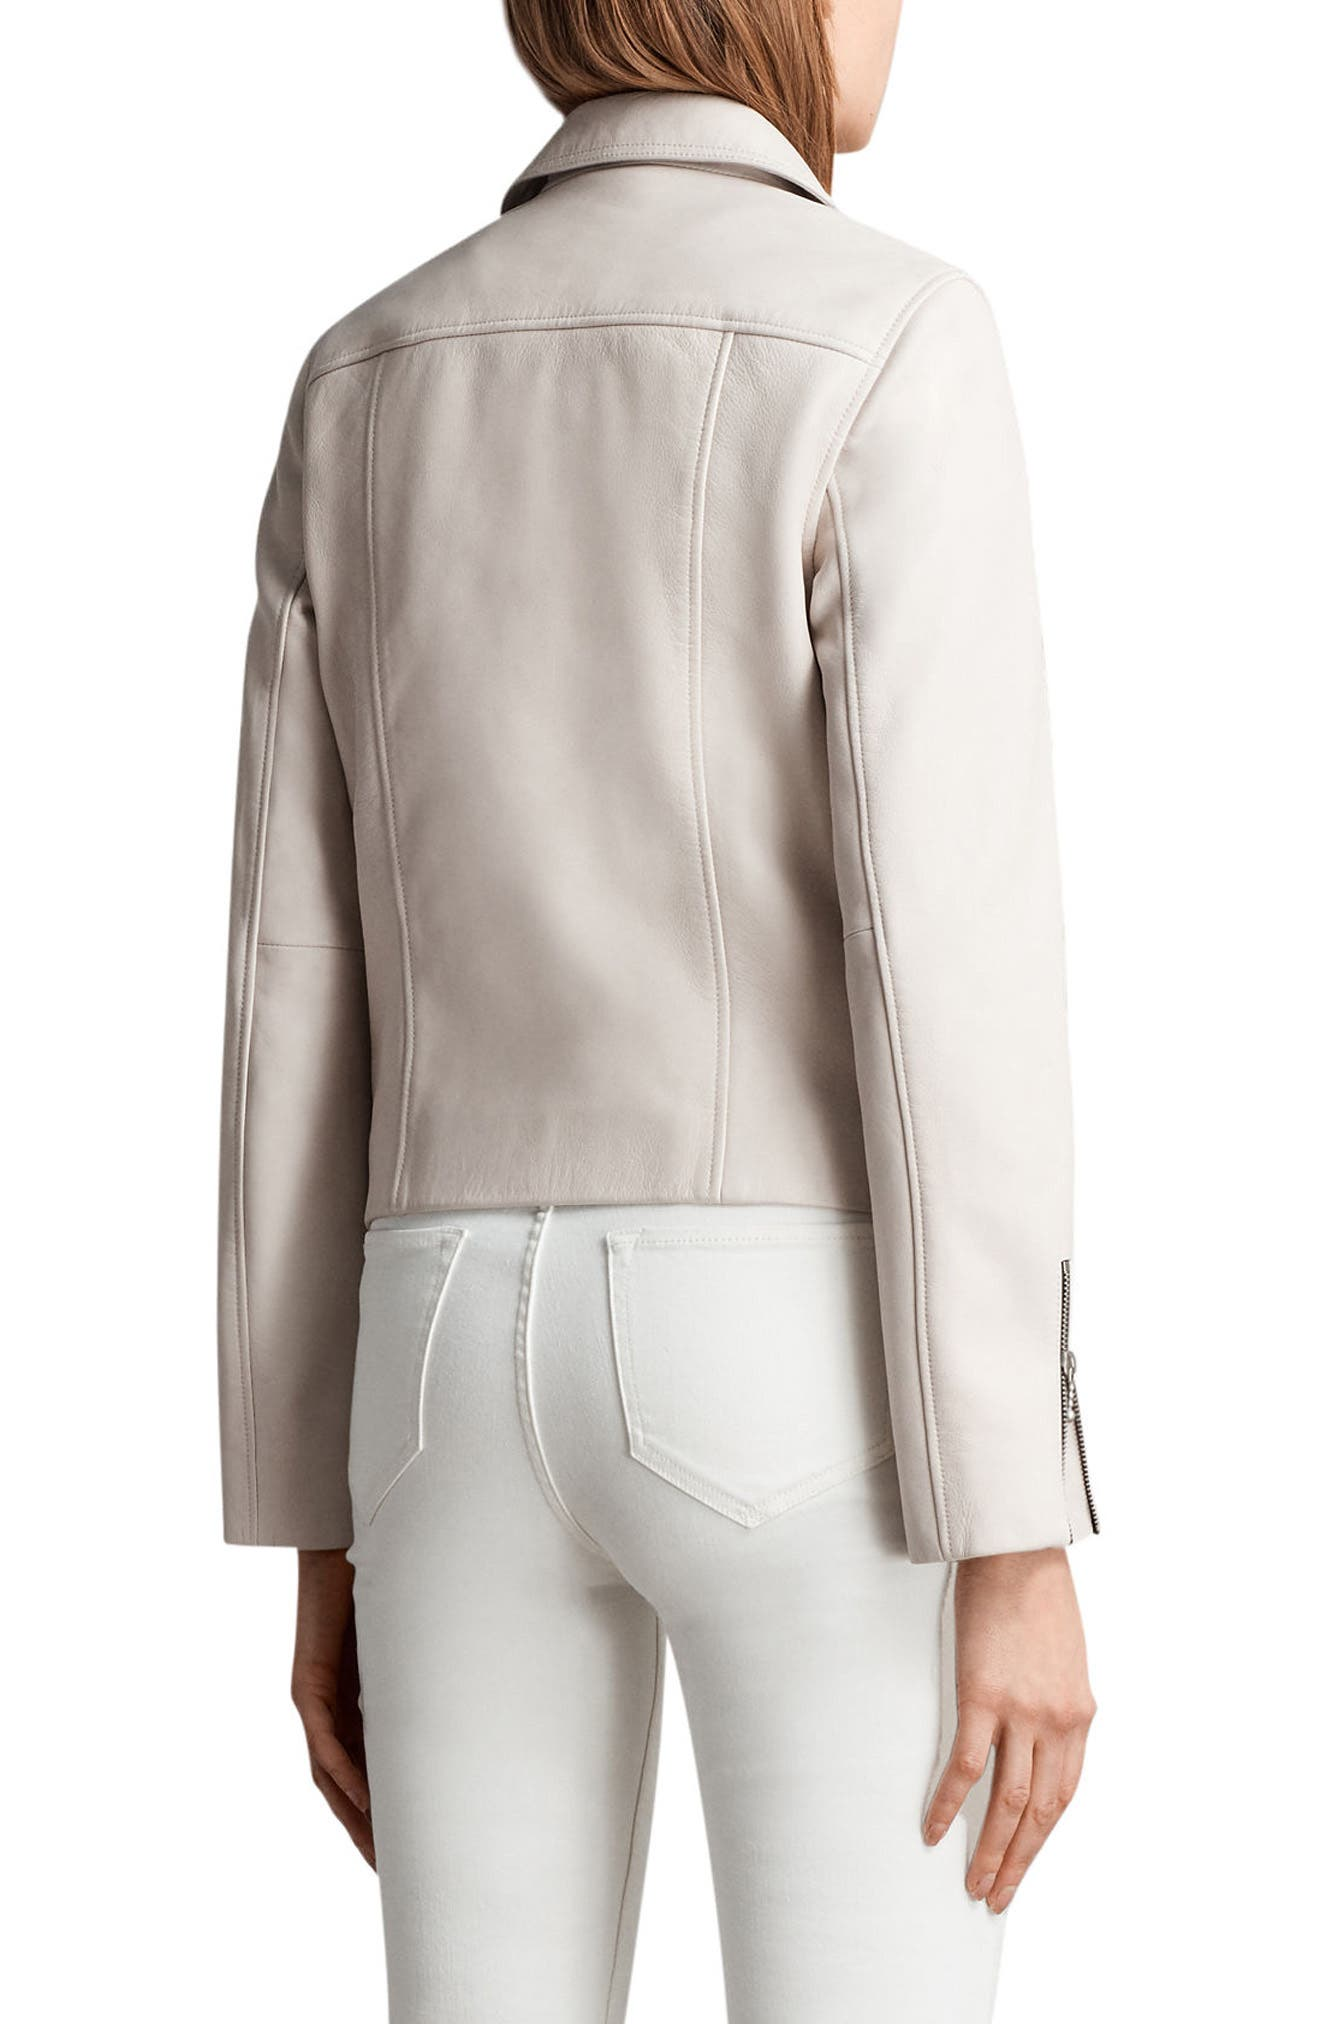 Prescott Leather Biker Jacket,                             Alternate thumbnail 2, color,                             Aries White